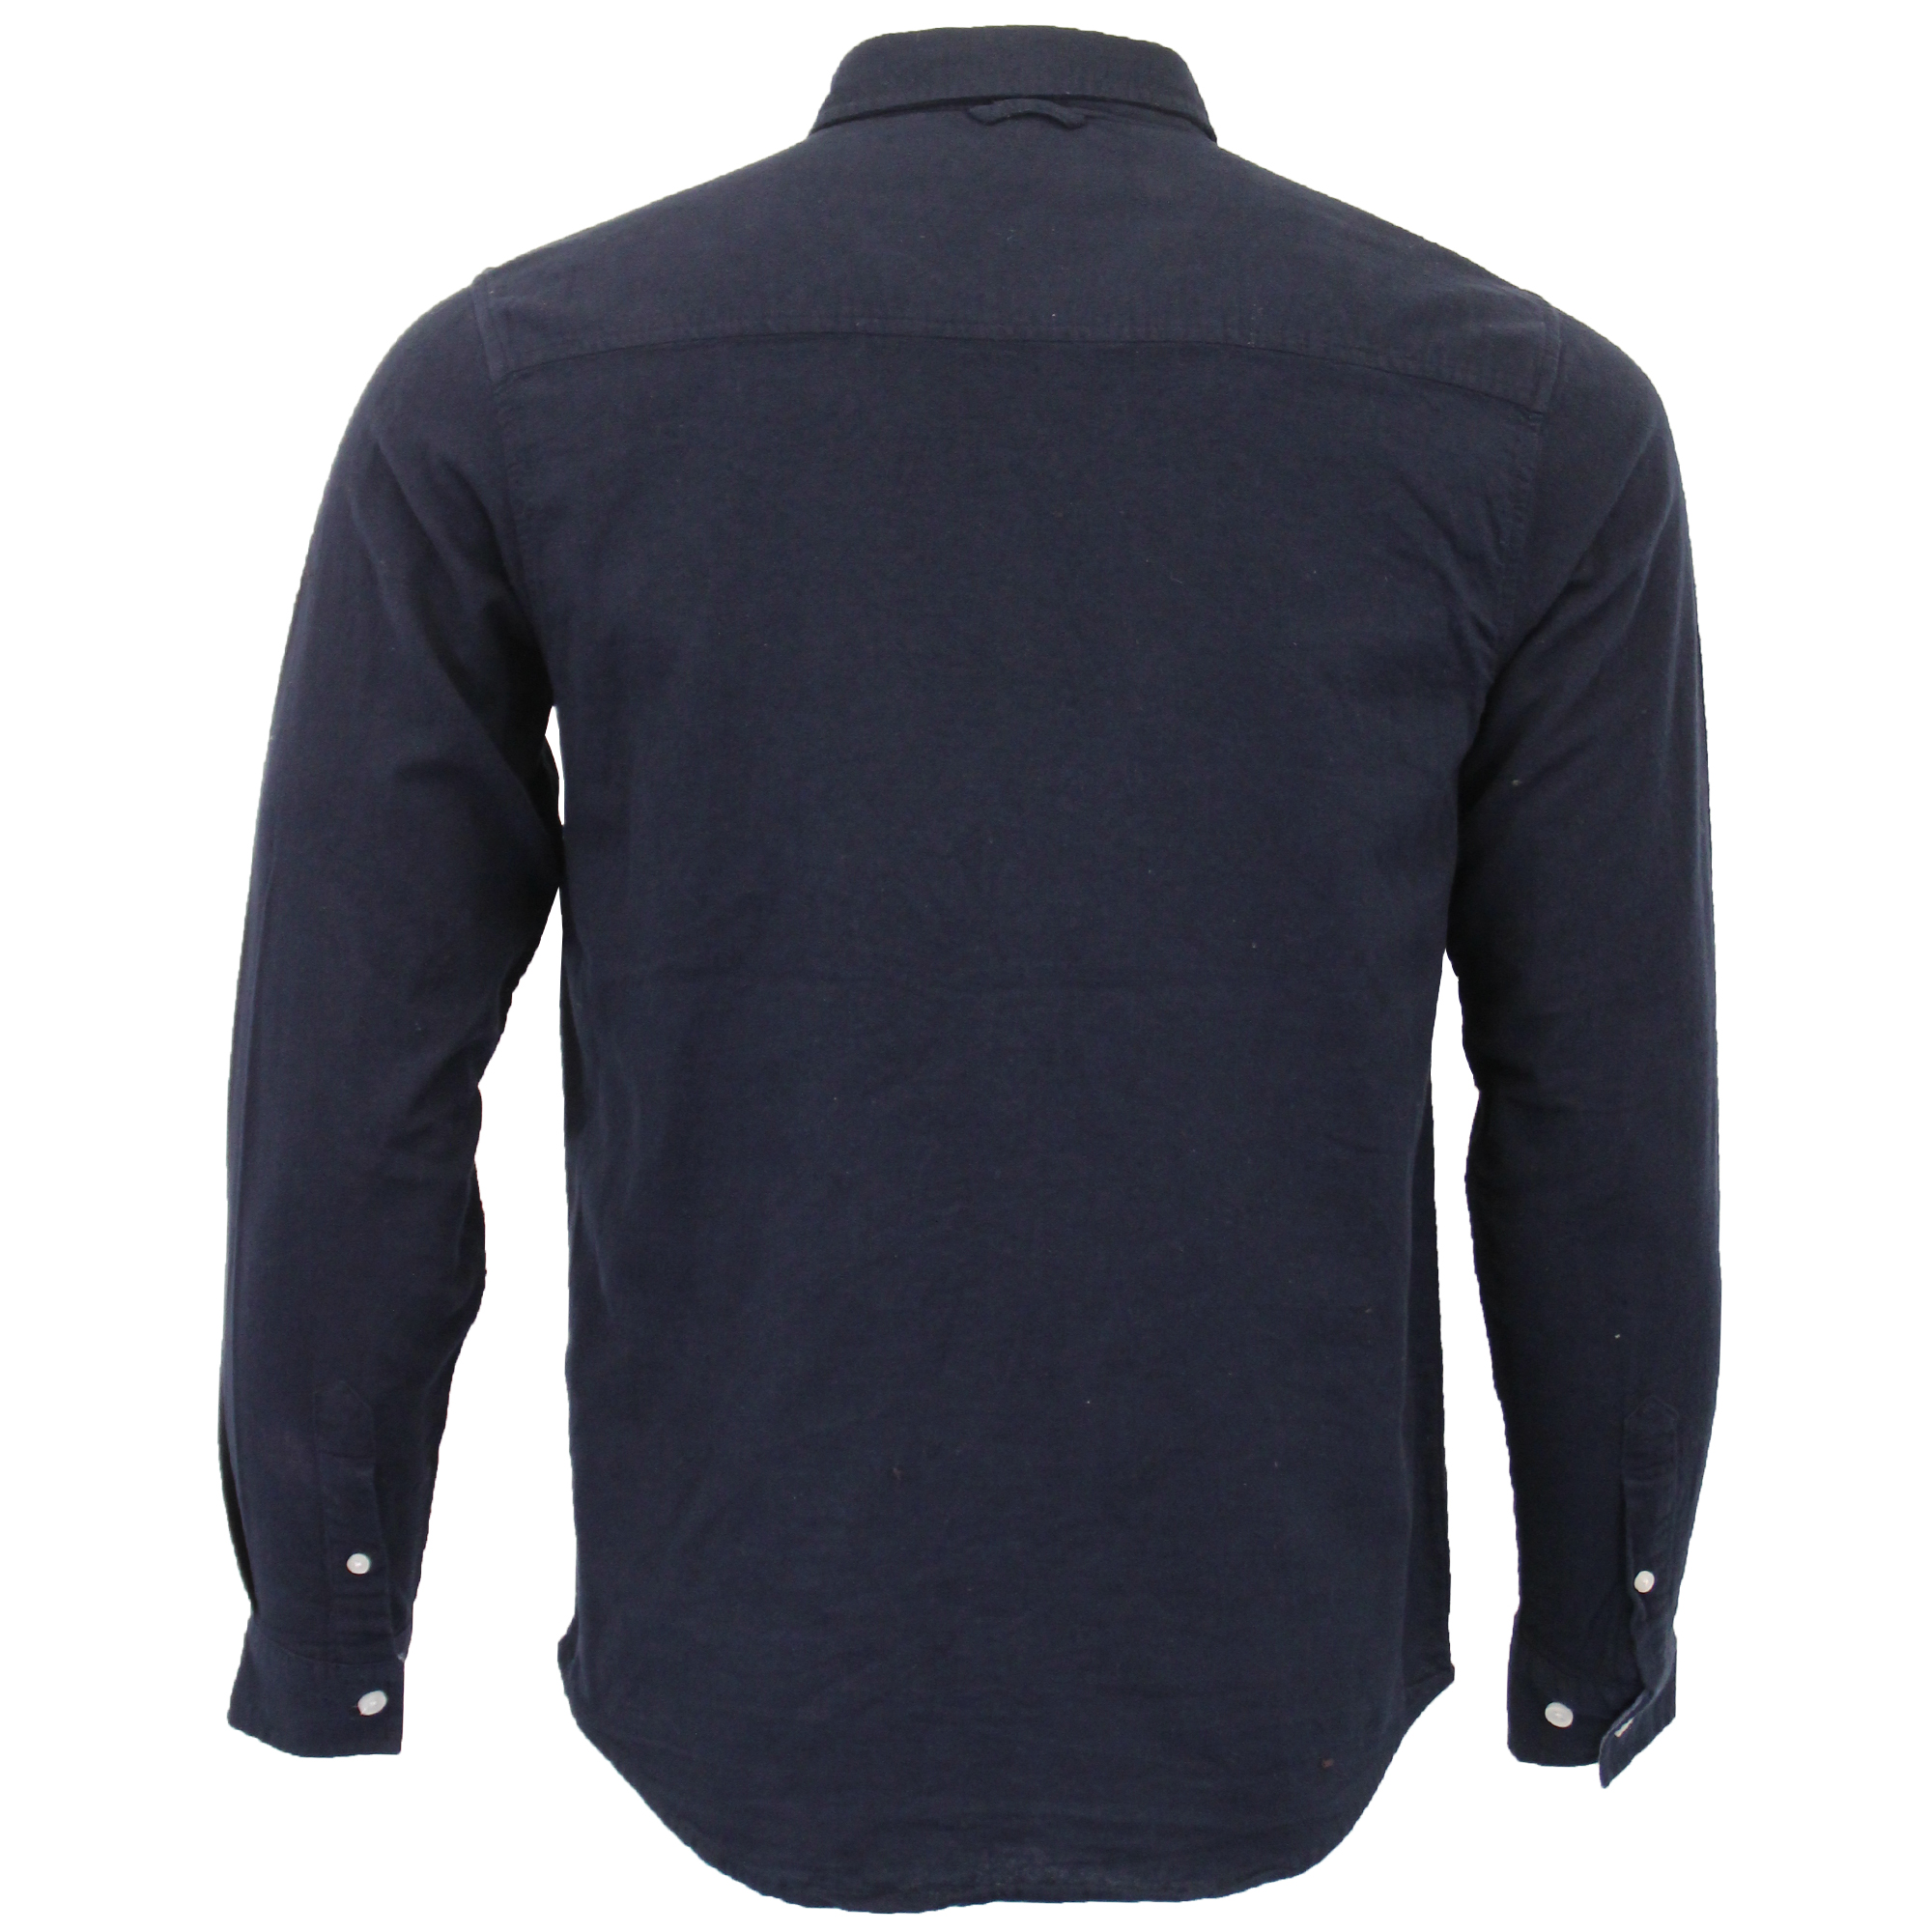 Mens-Brushed-Cotton-Shirt-Brave-Soul-Long-Sleeved-Flannel-HOLMES-Casual-Designer thumbnail 15